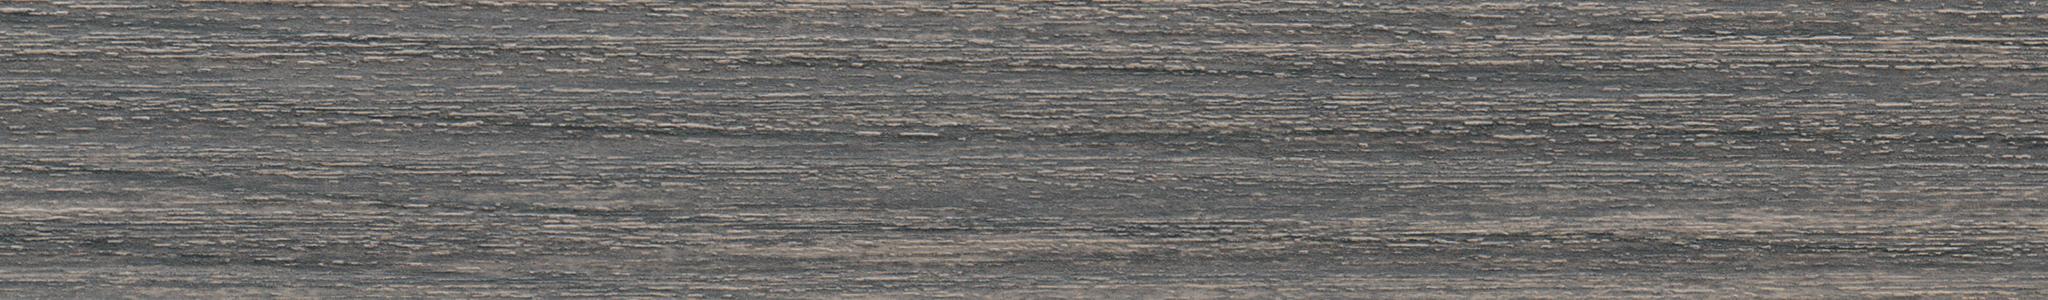 HD 253766 кромка ABS вяз коричневый гравировка